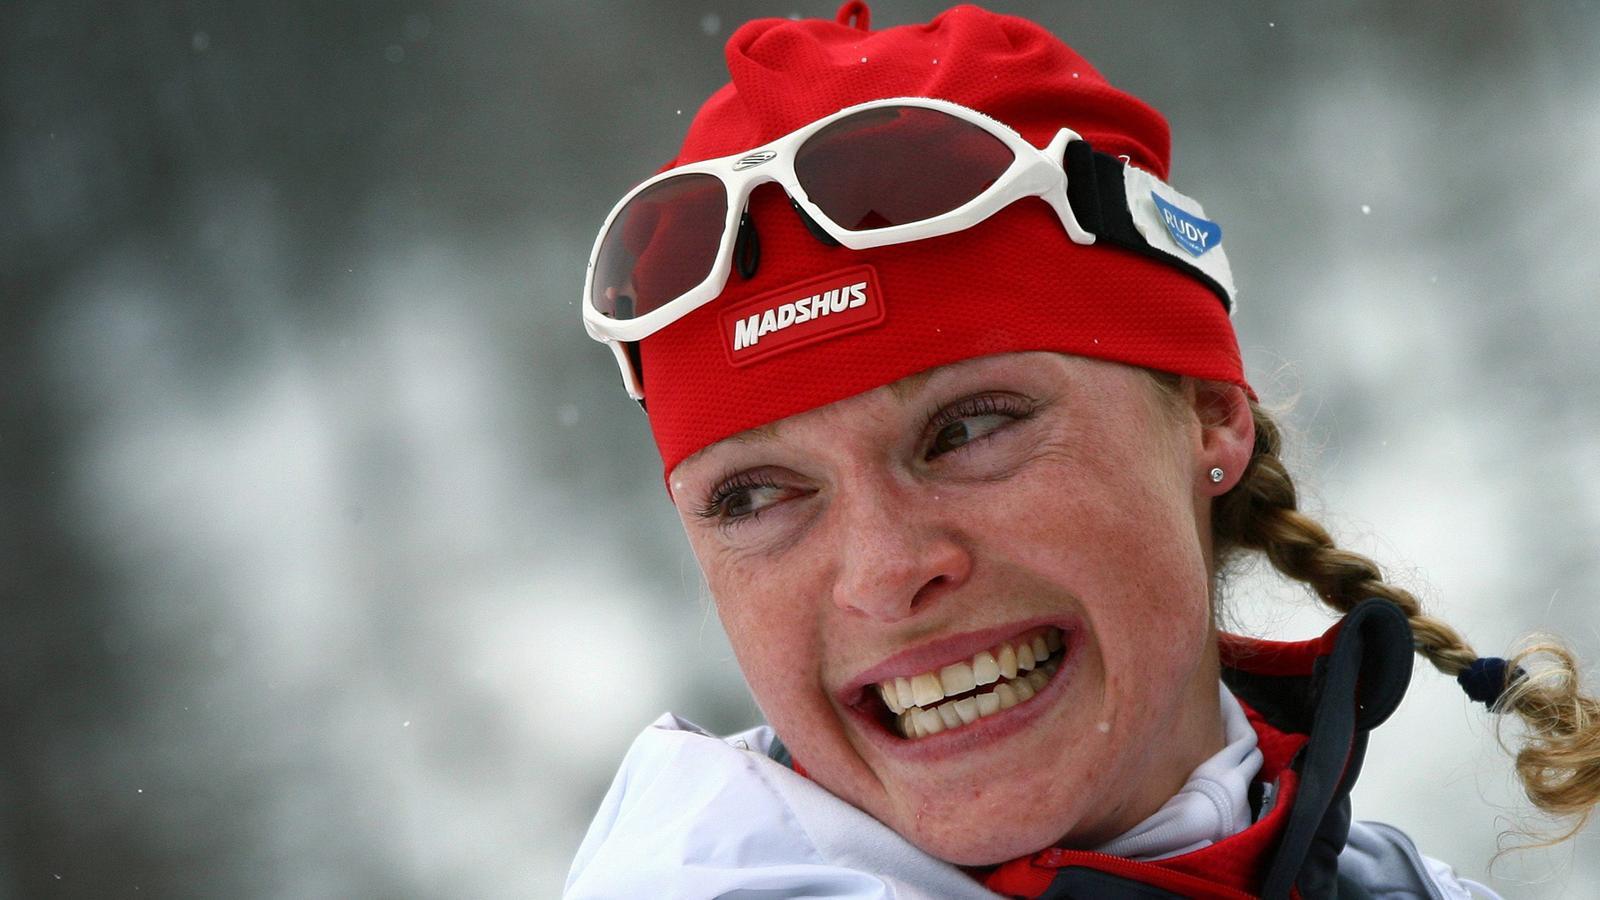 вам только лыжница грета нюккельмо фото учила, сама баб